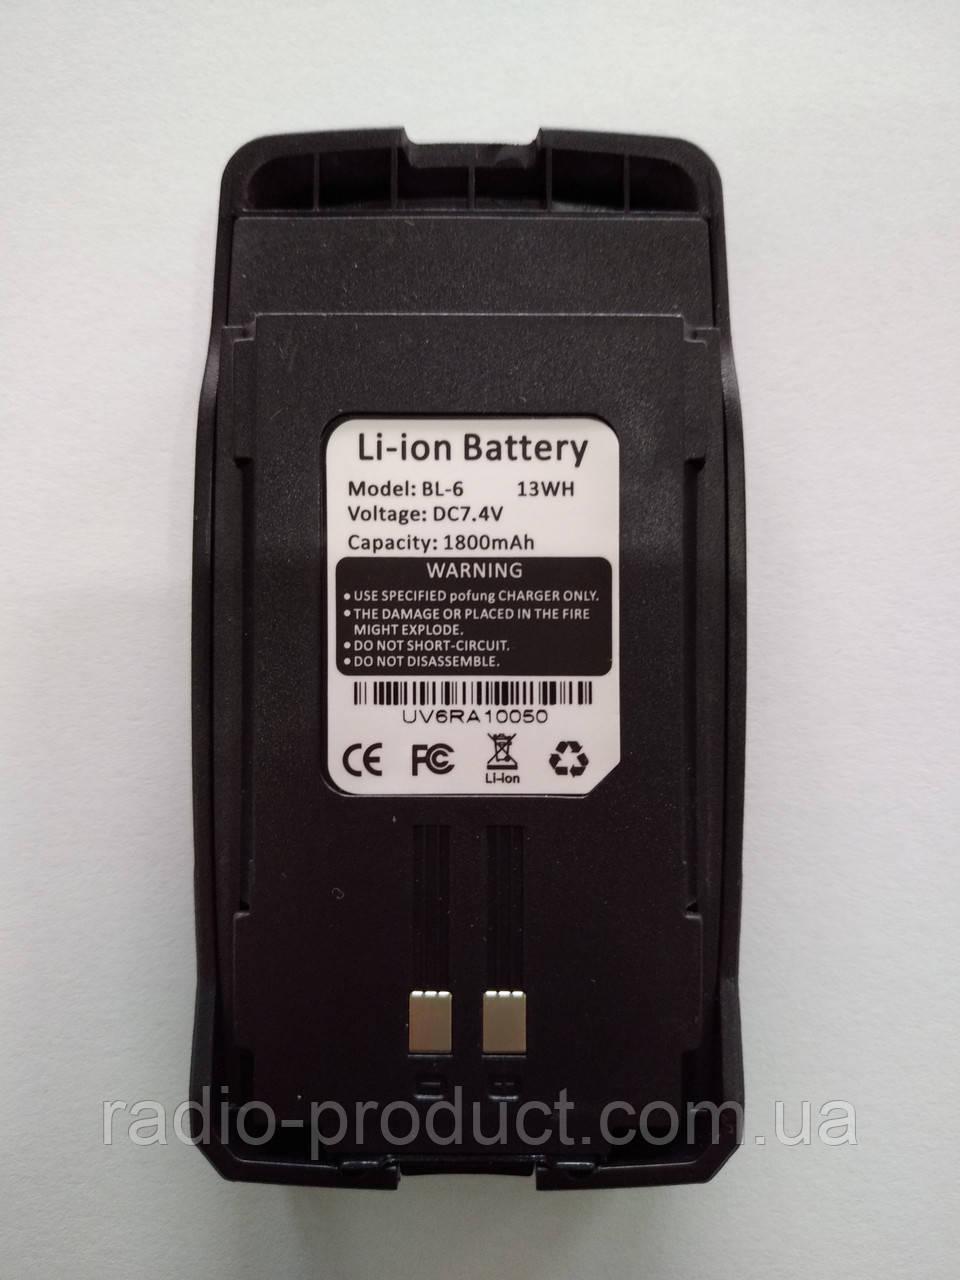 BL-6 аккумулятор для радиостанции Baofeng UV-6R